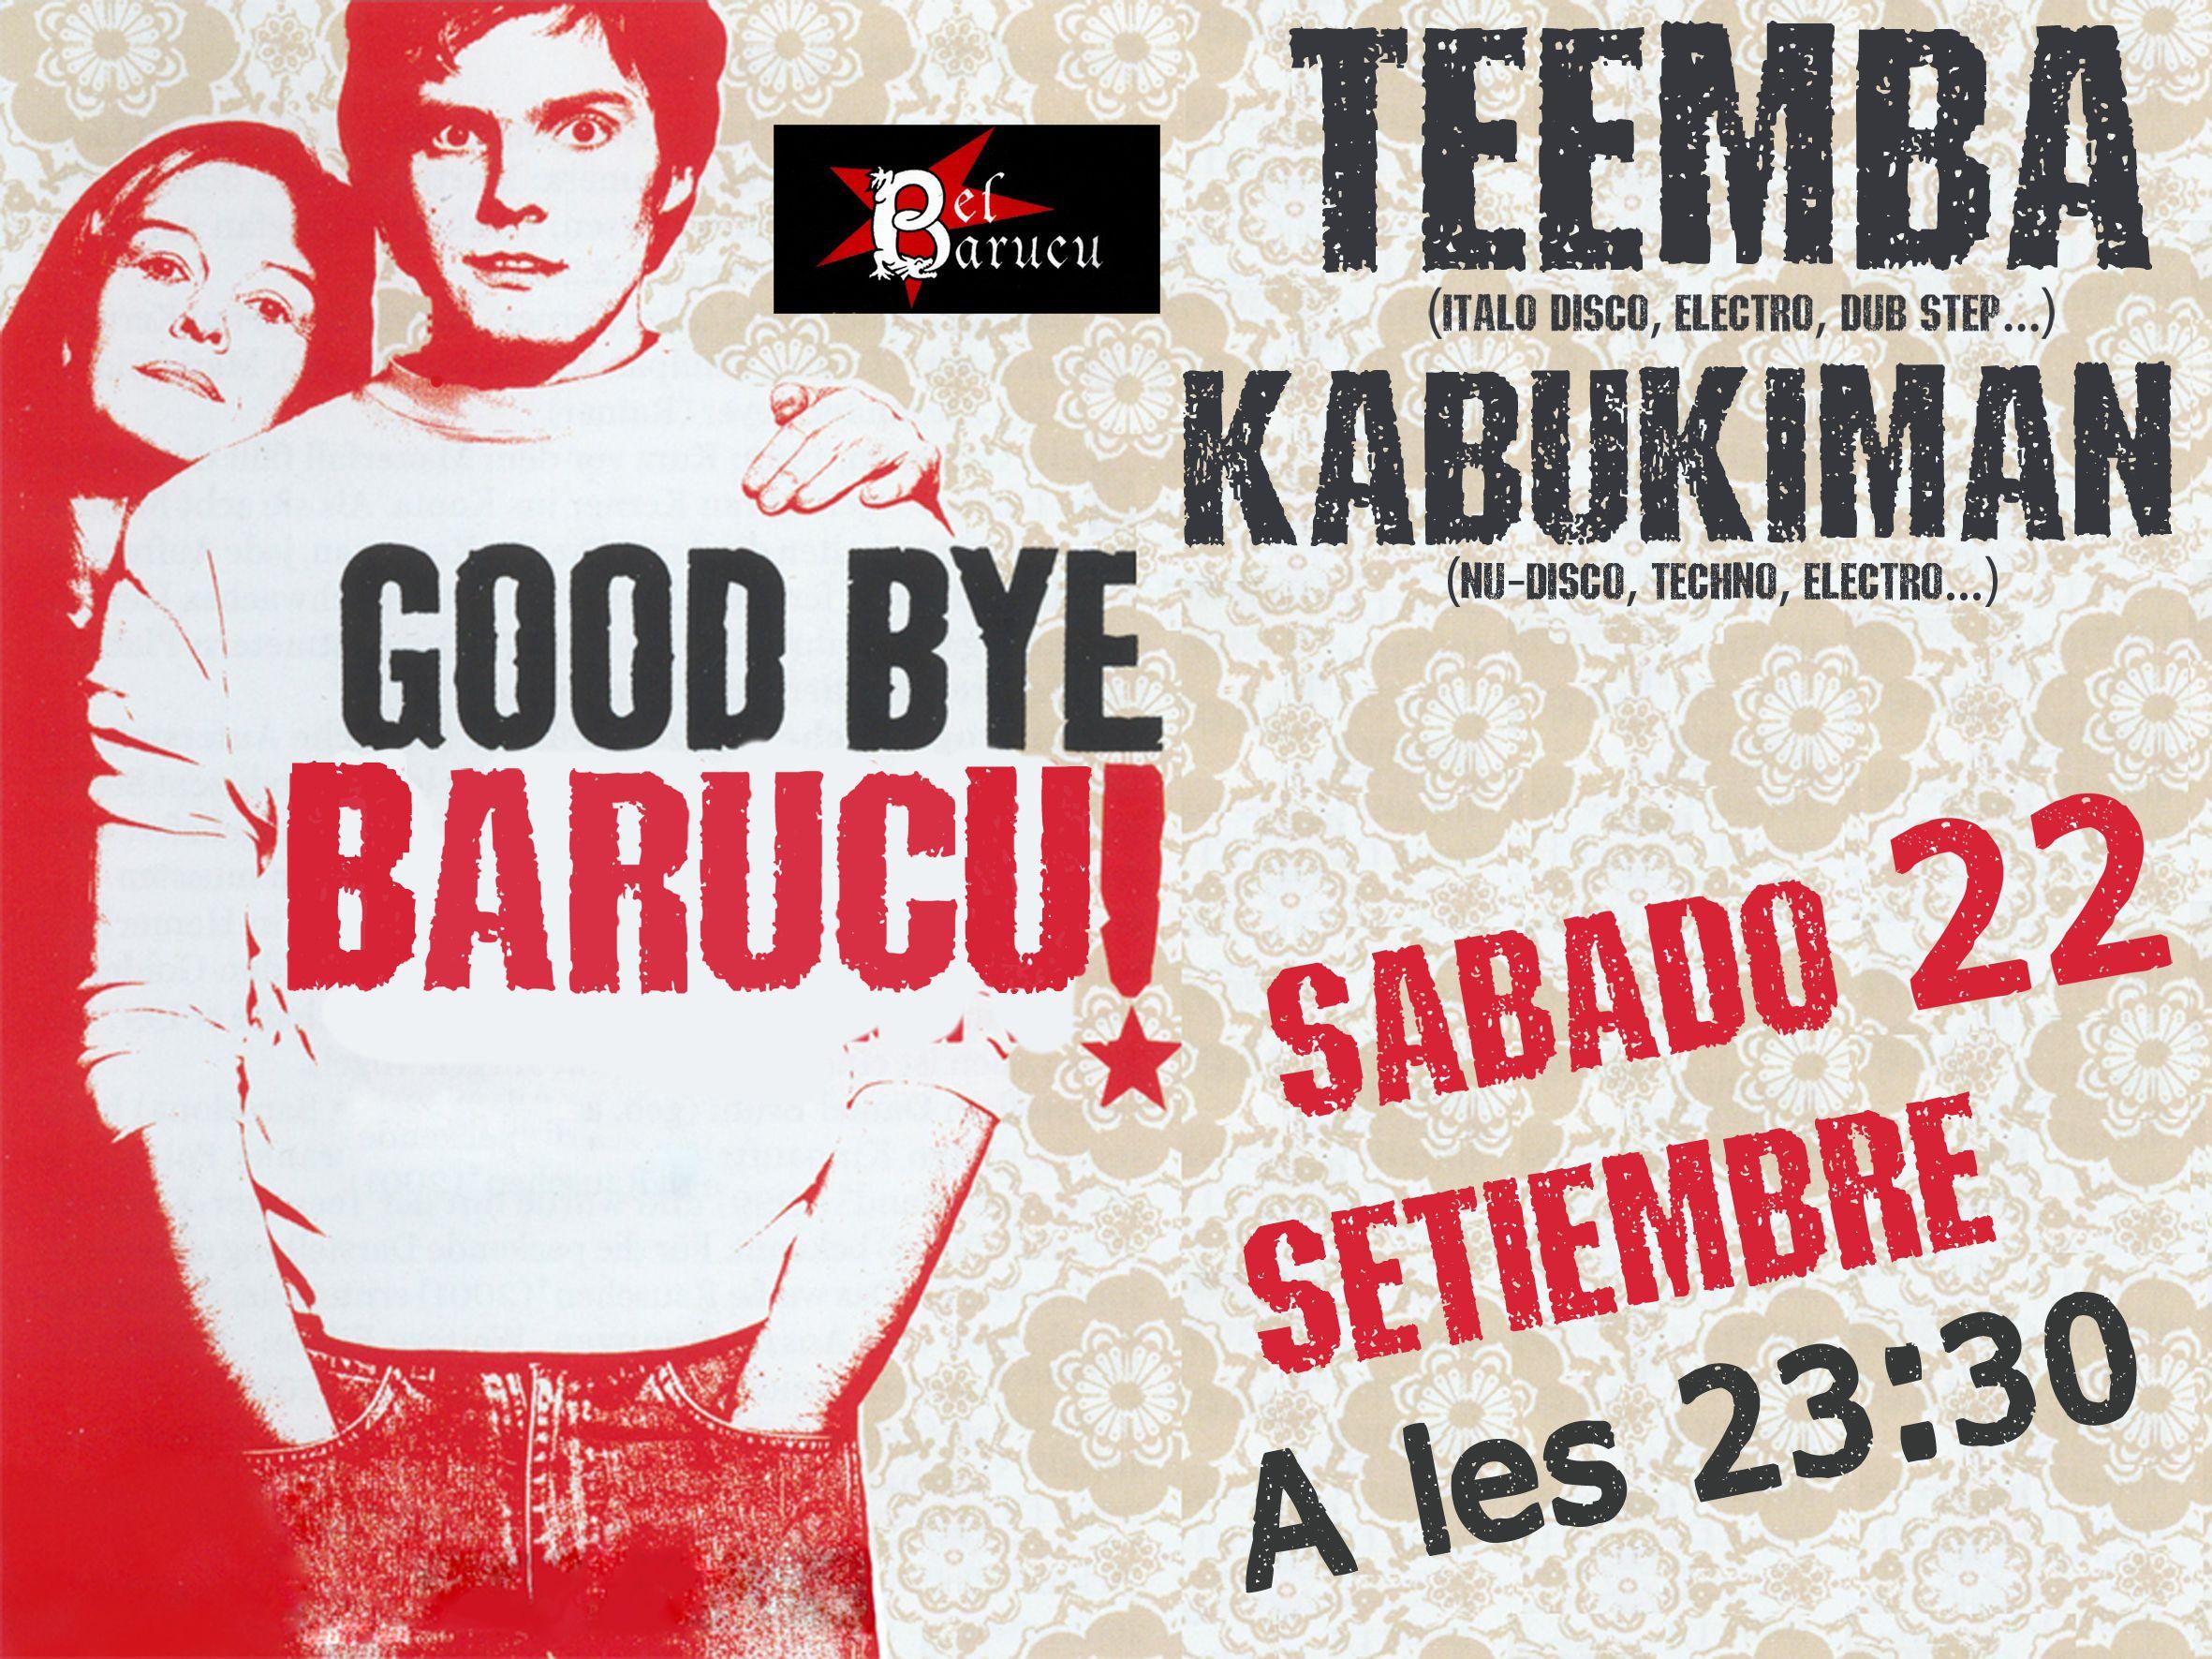 GOOD BYE BARUCU !!!